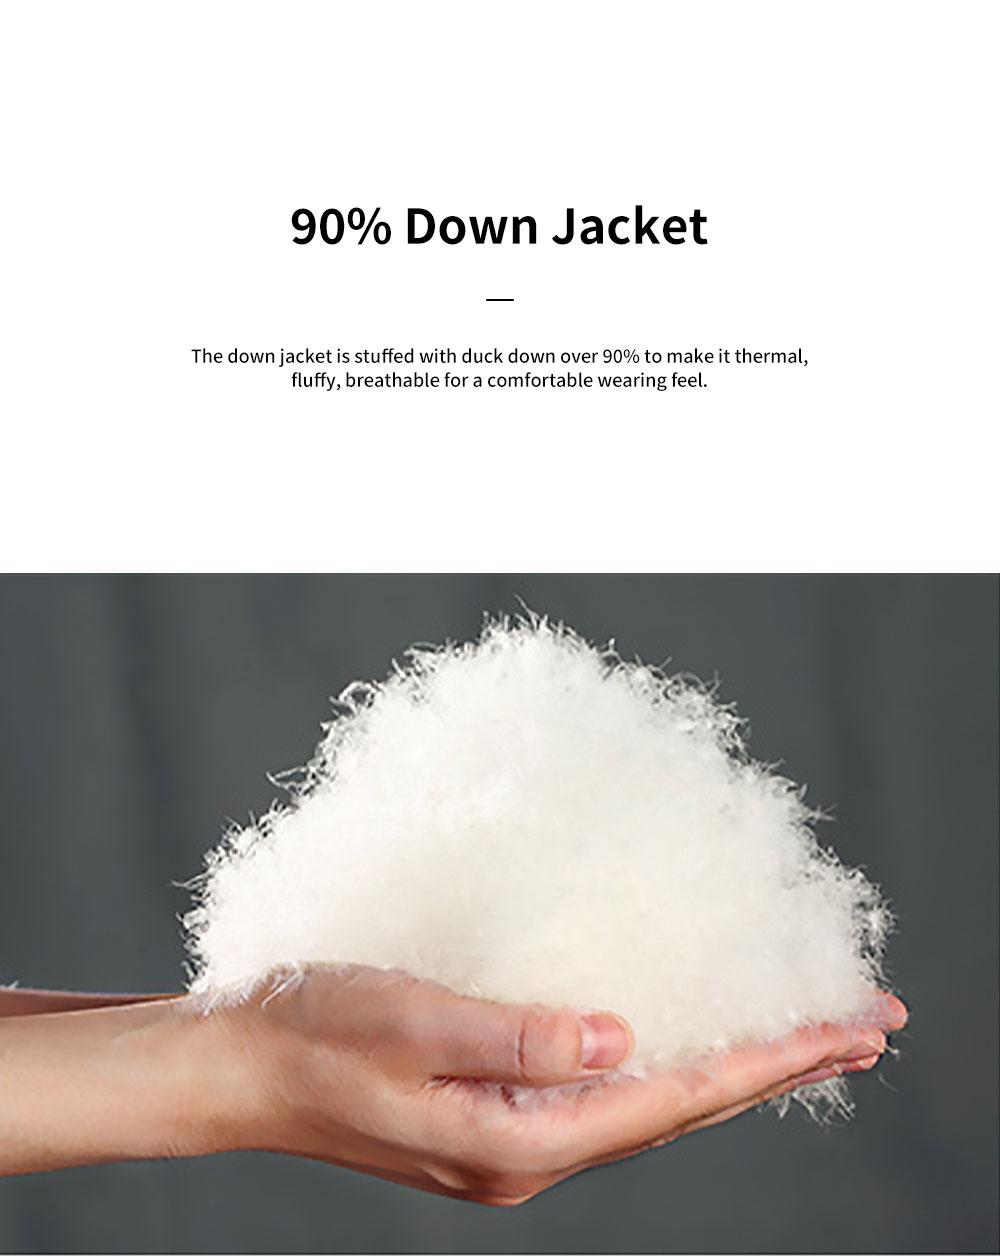 ELFSACK 2019 NEW Splicing Glossy Down Jacket for Women Winter Wear Loose Down Coat Fashion Down Jacket 2